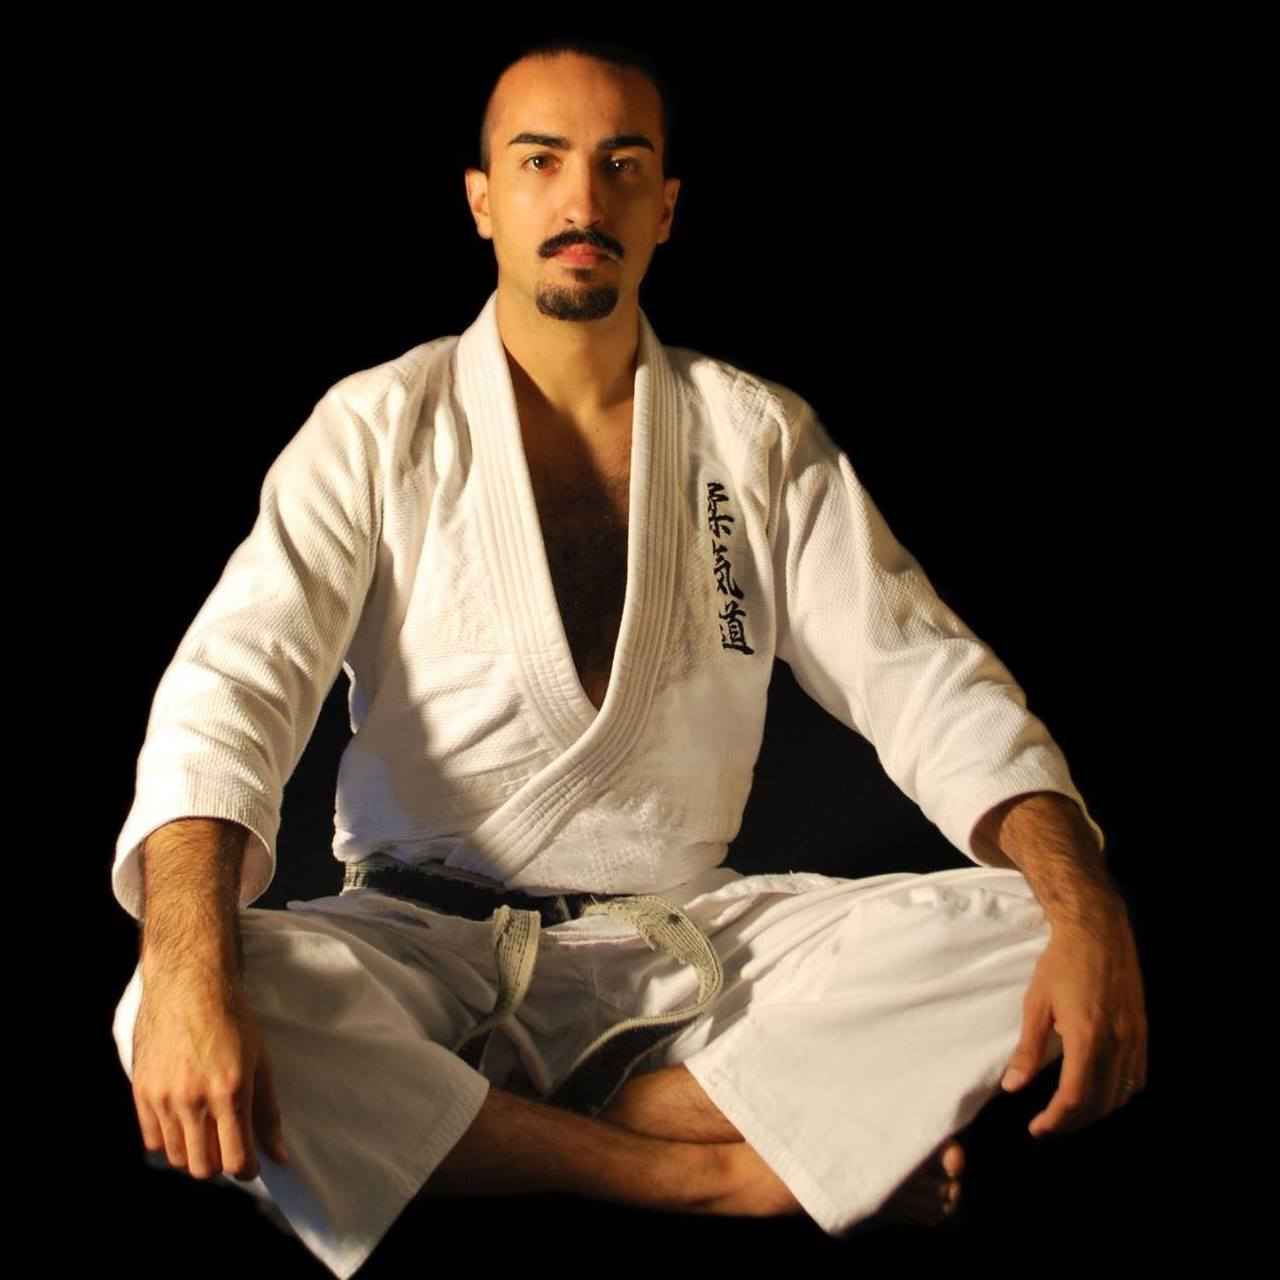 George Rego Sensei - Jukido Jujitsu Master